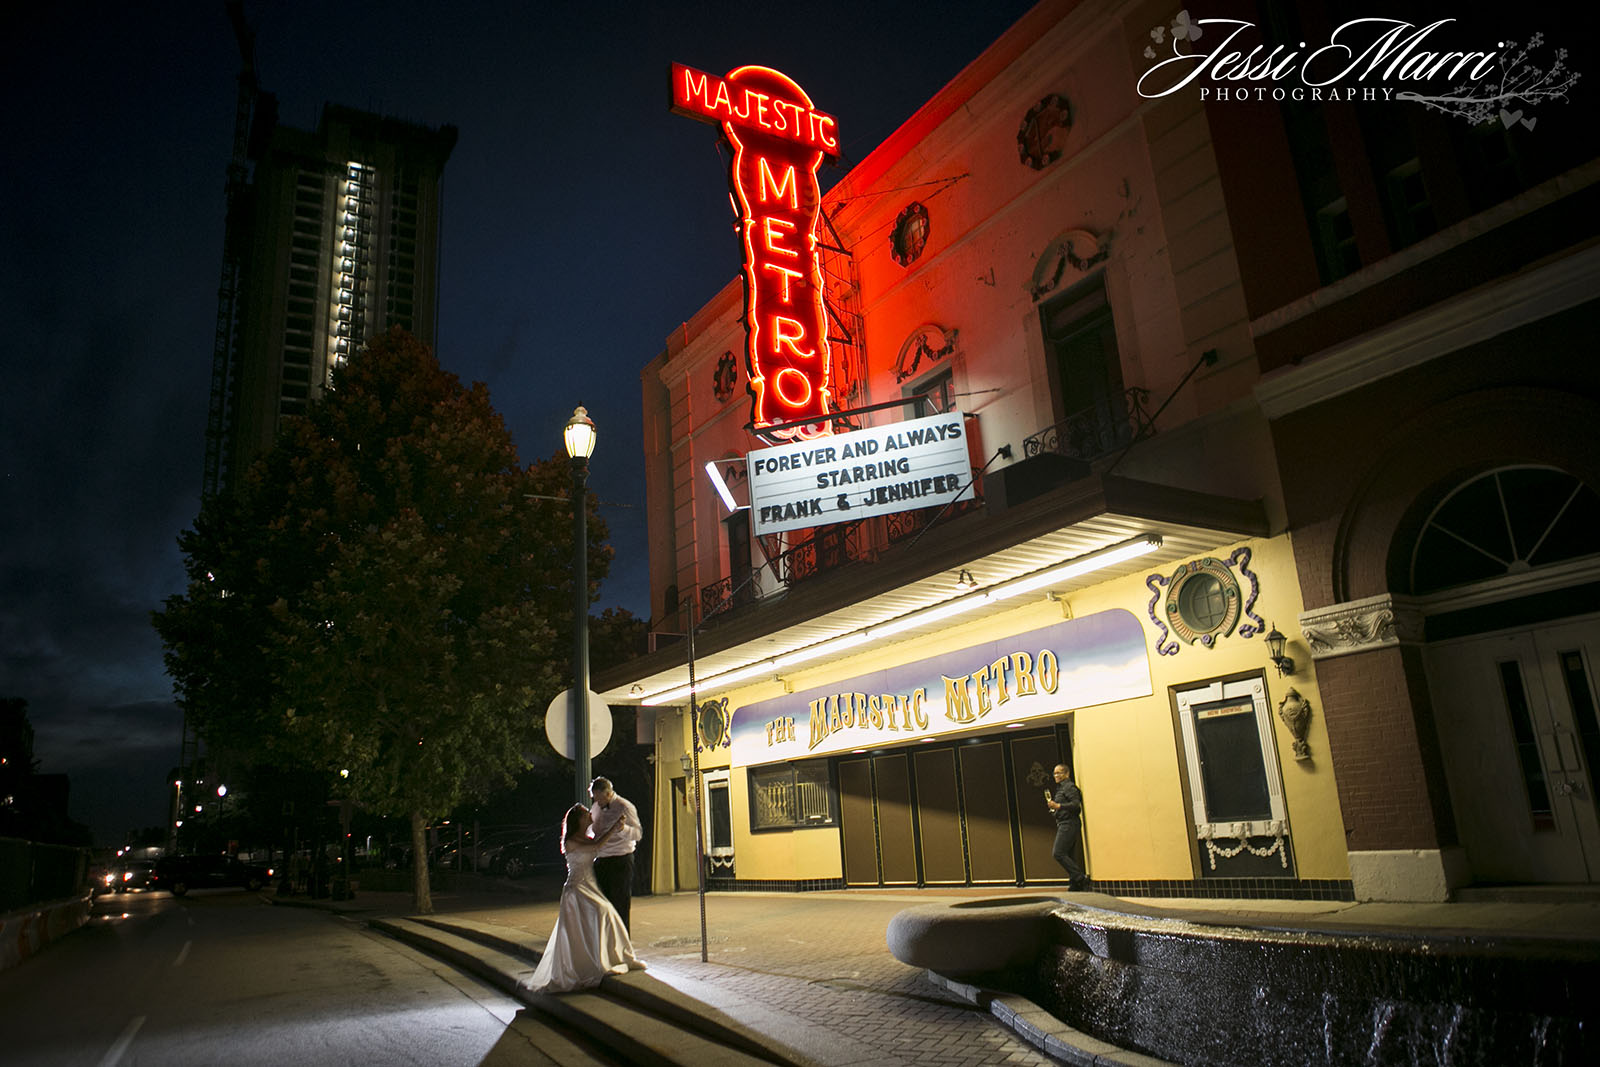 Wedding Photography Houston Prices: Houston Wedding Photographer